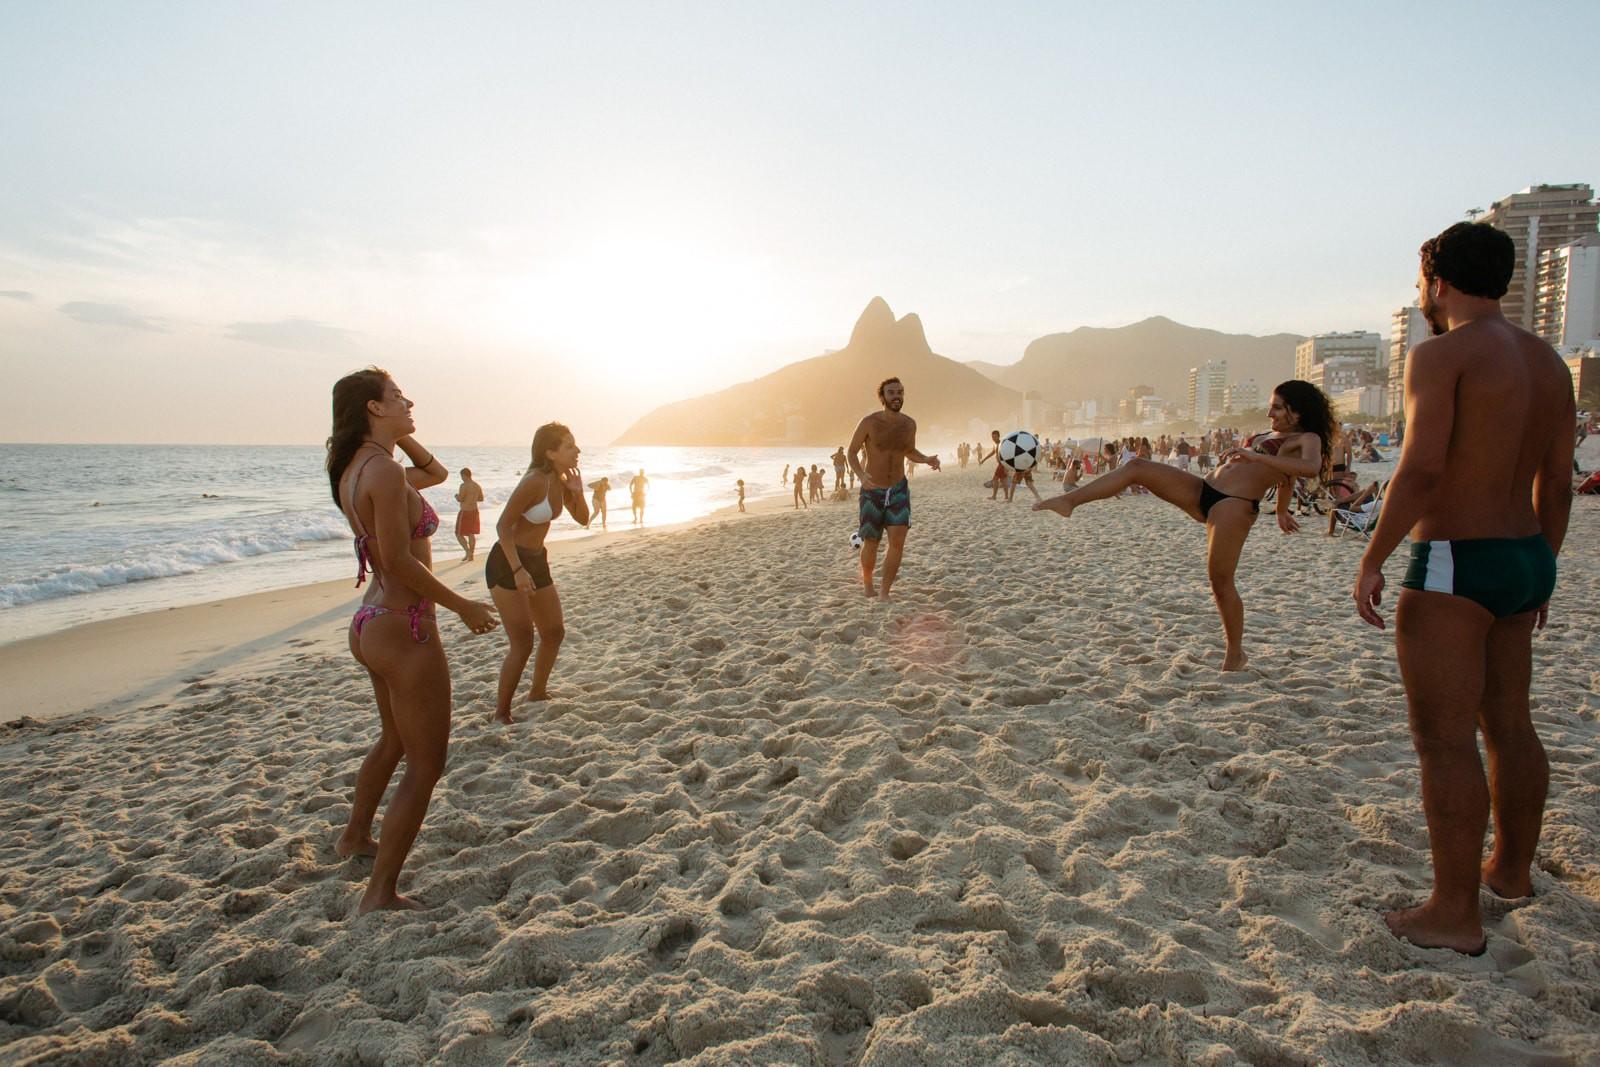 Nude beach 4